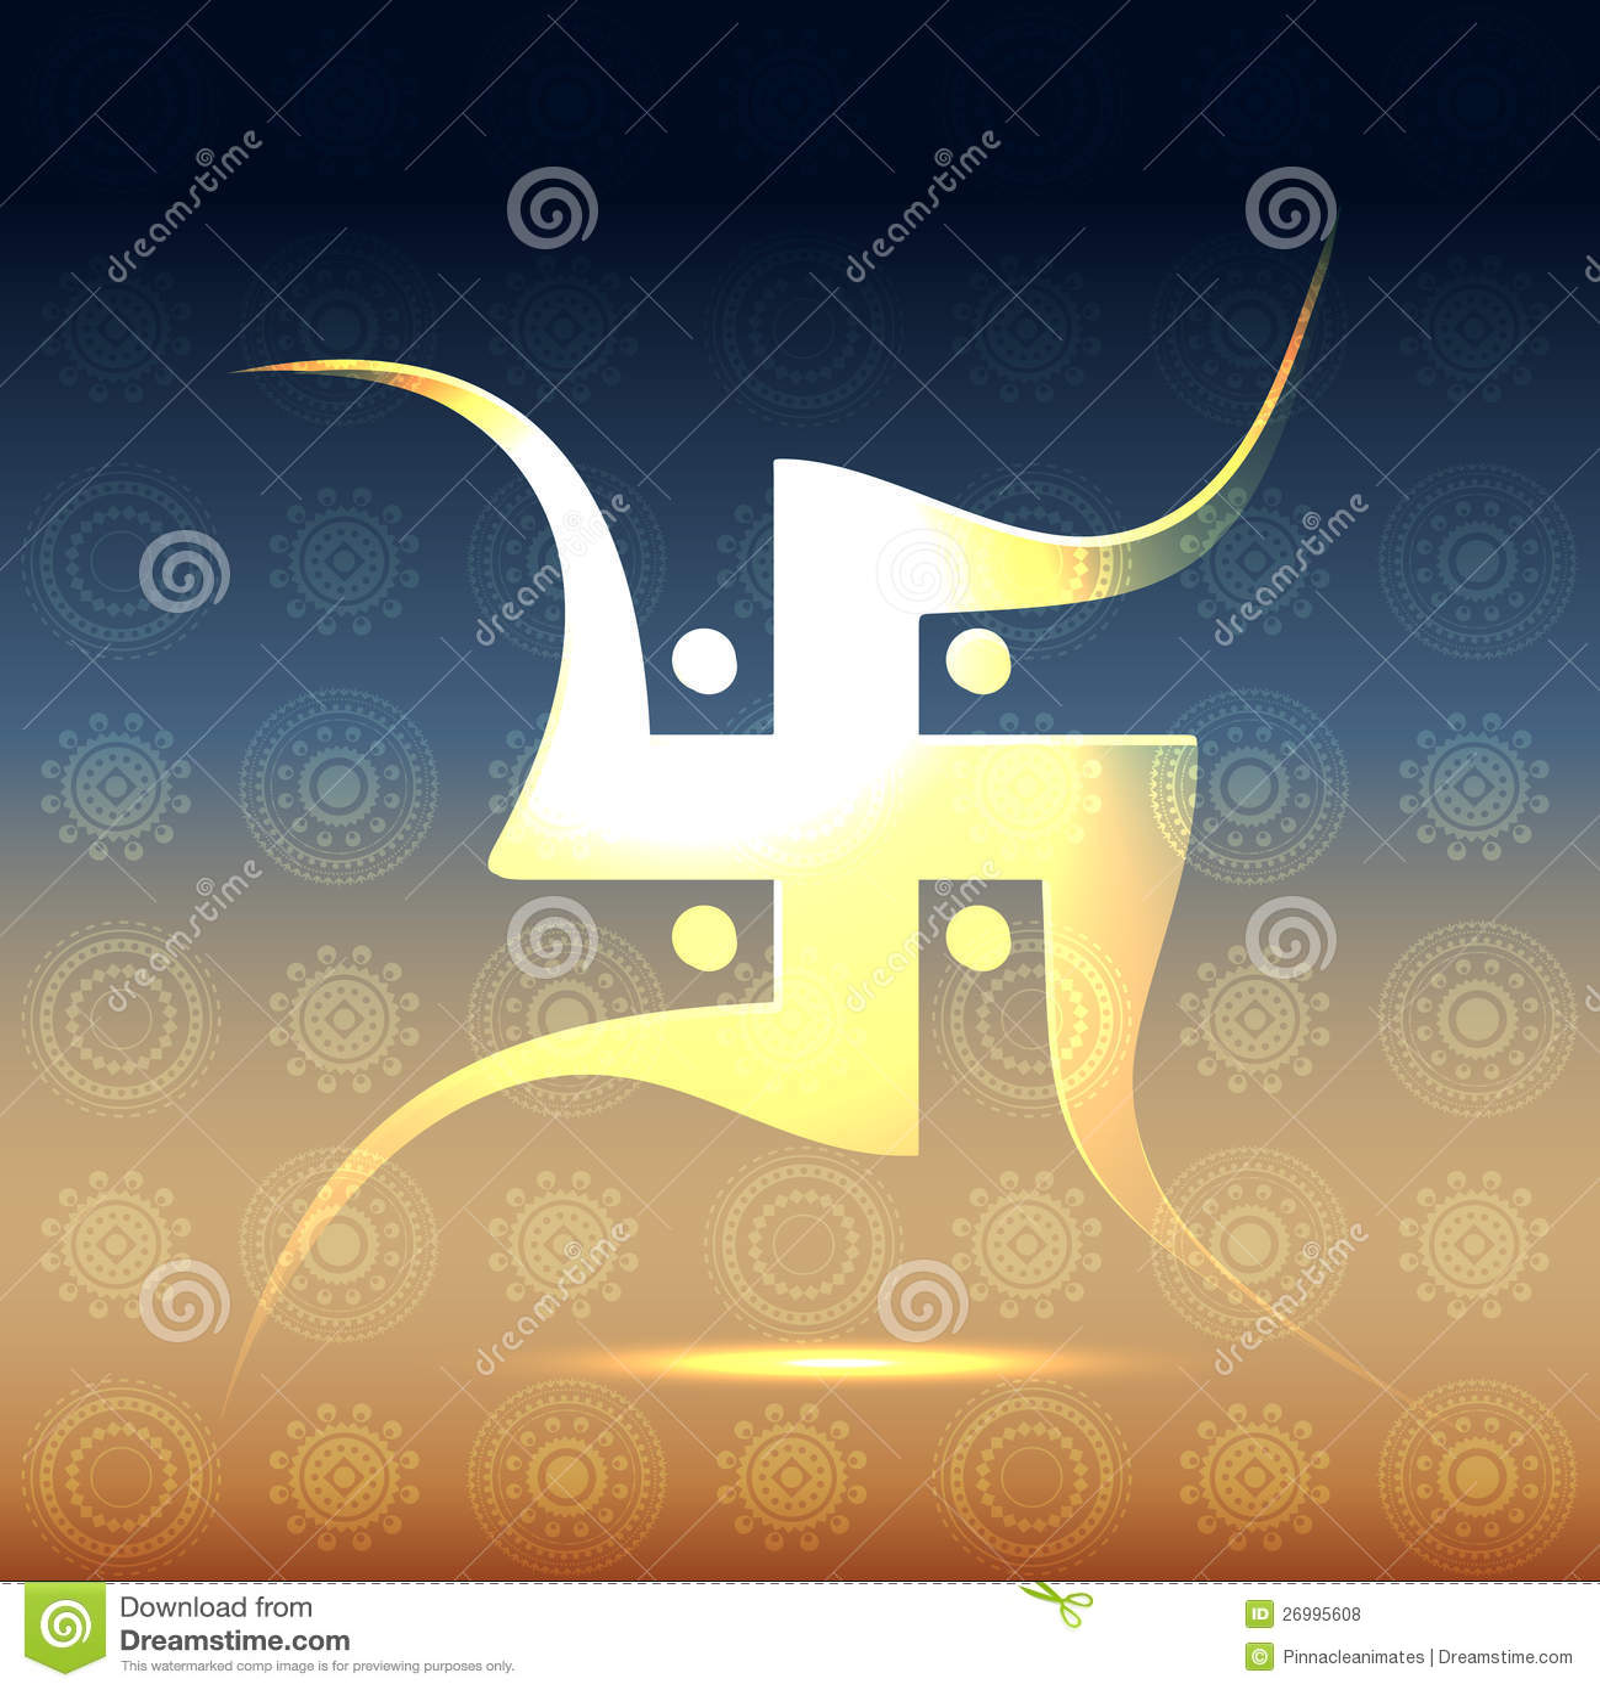 Swastik Symbol Stock Vector Illustration Of Design Shiny 26995608